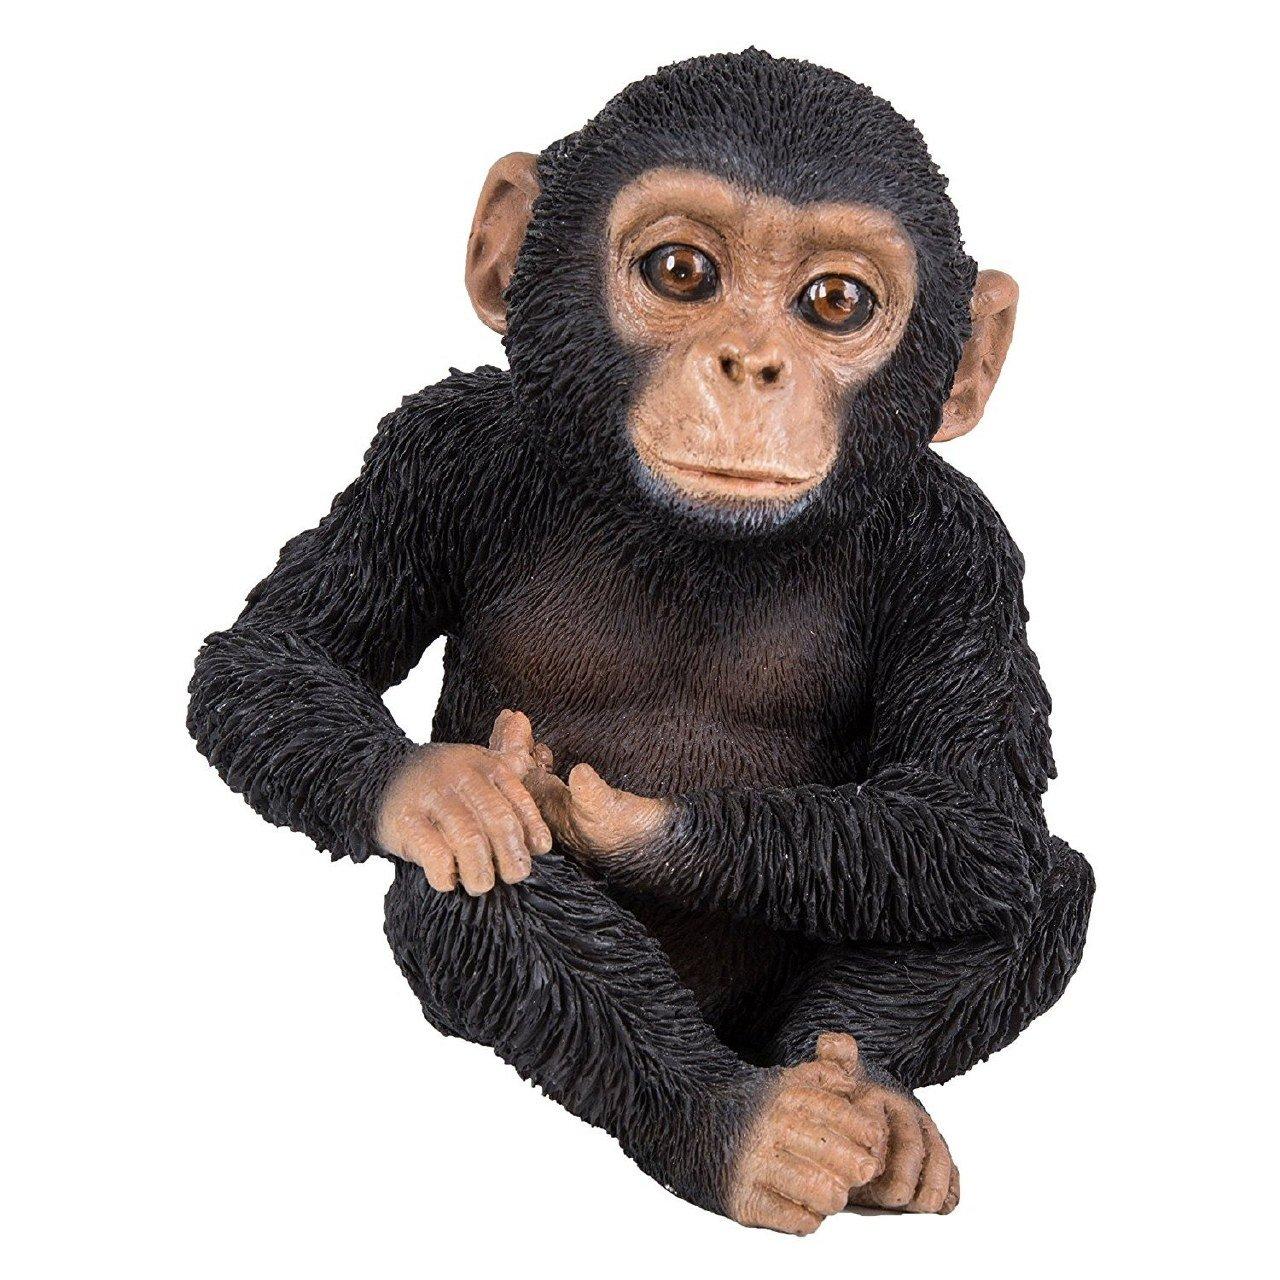 Vivid Arts XRL-NIM3-D Sentado chimpanc/é Ornamento de Resina